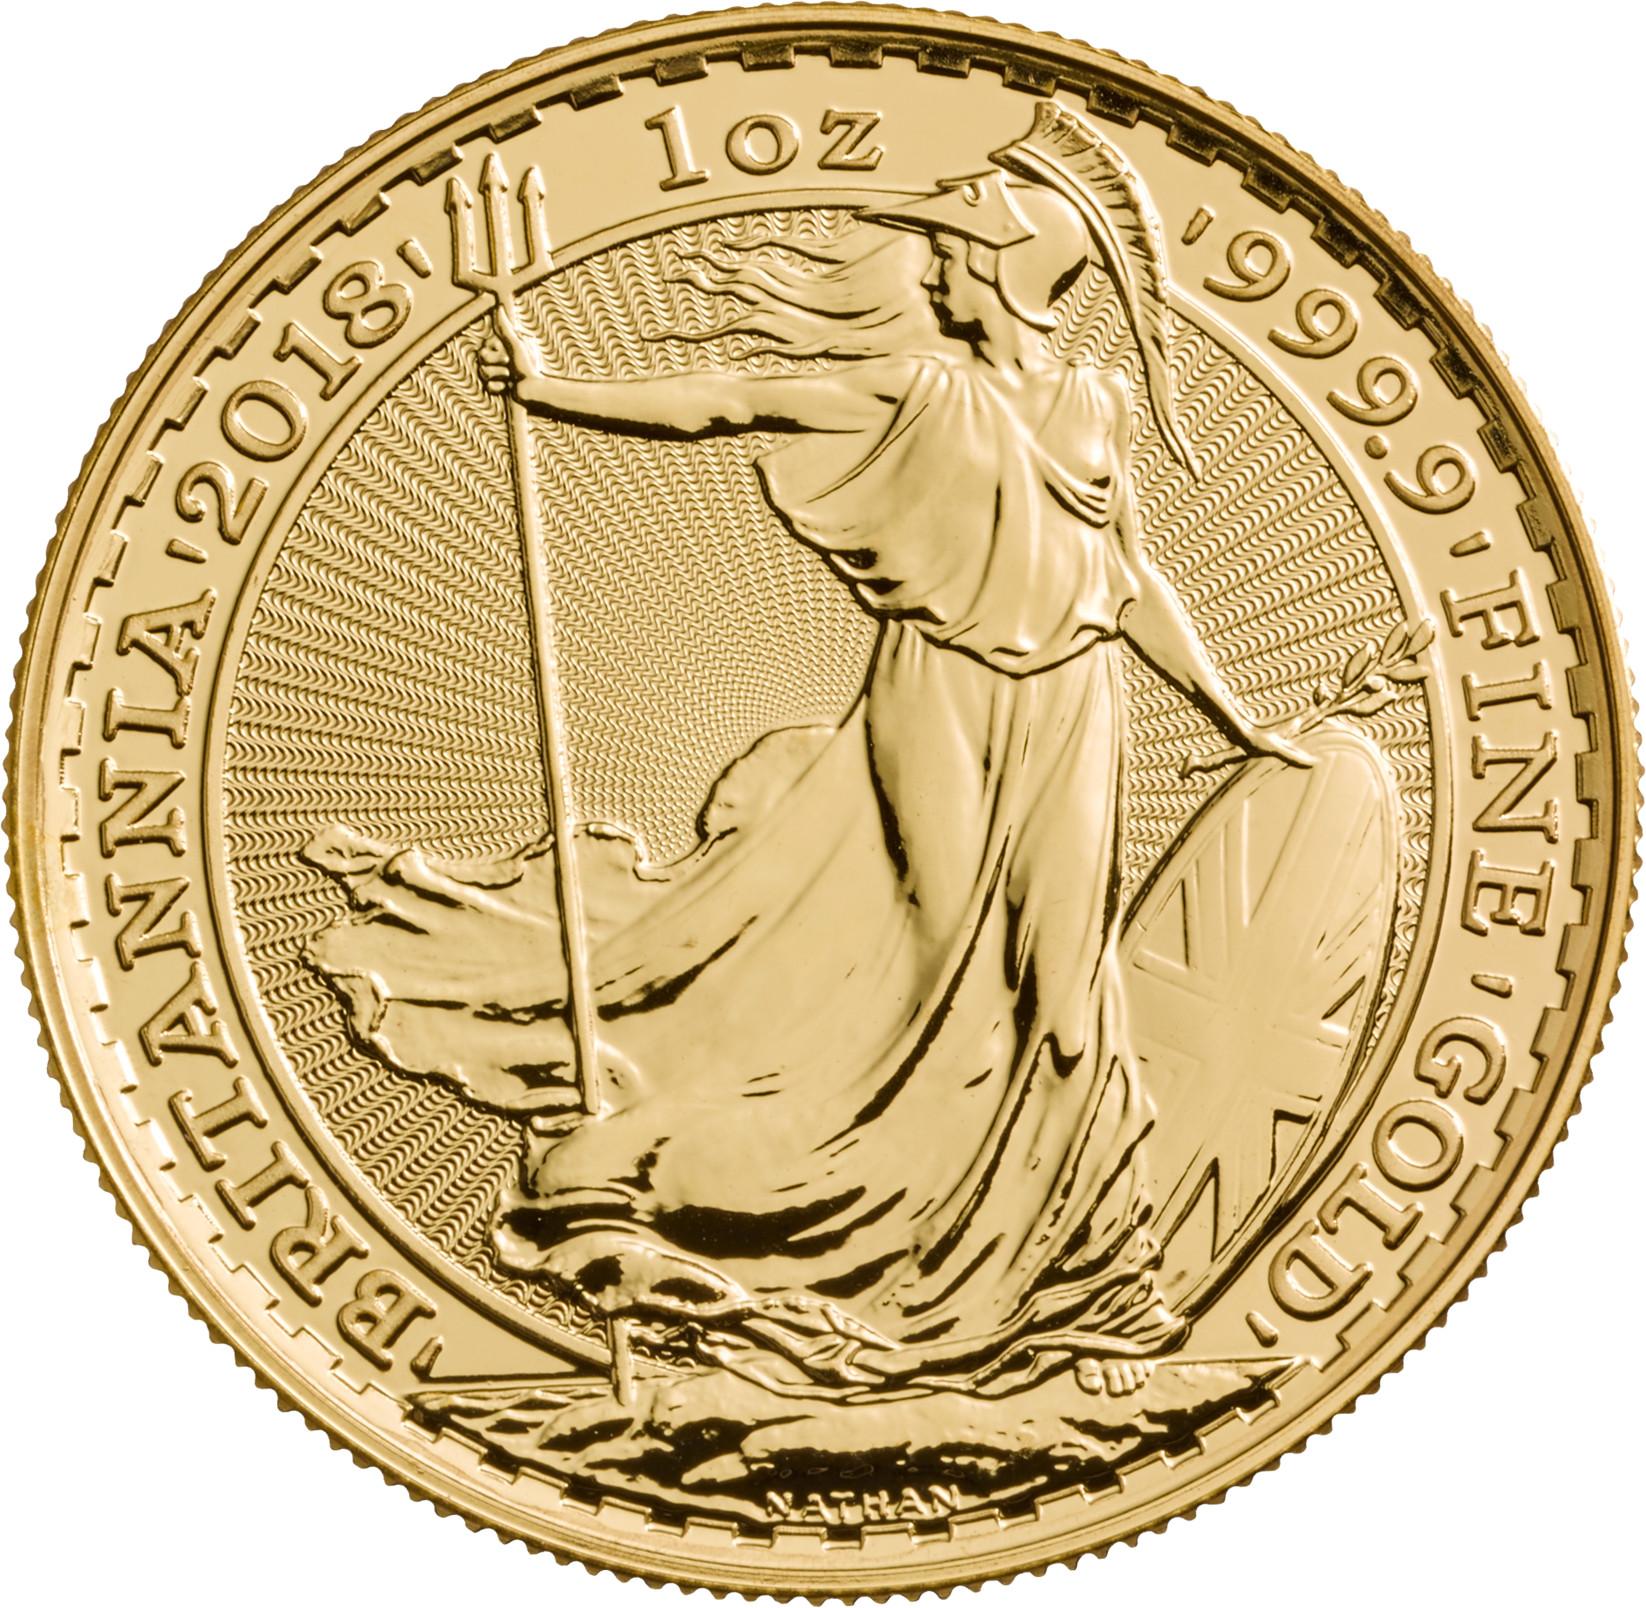 2018 Britannia One Ounce Gold Coin 1 351